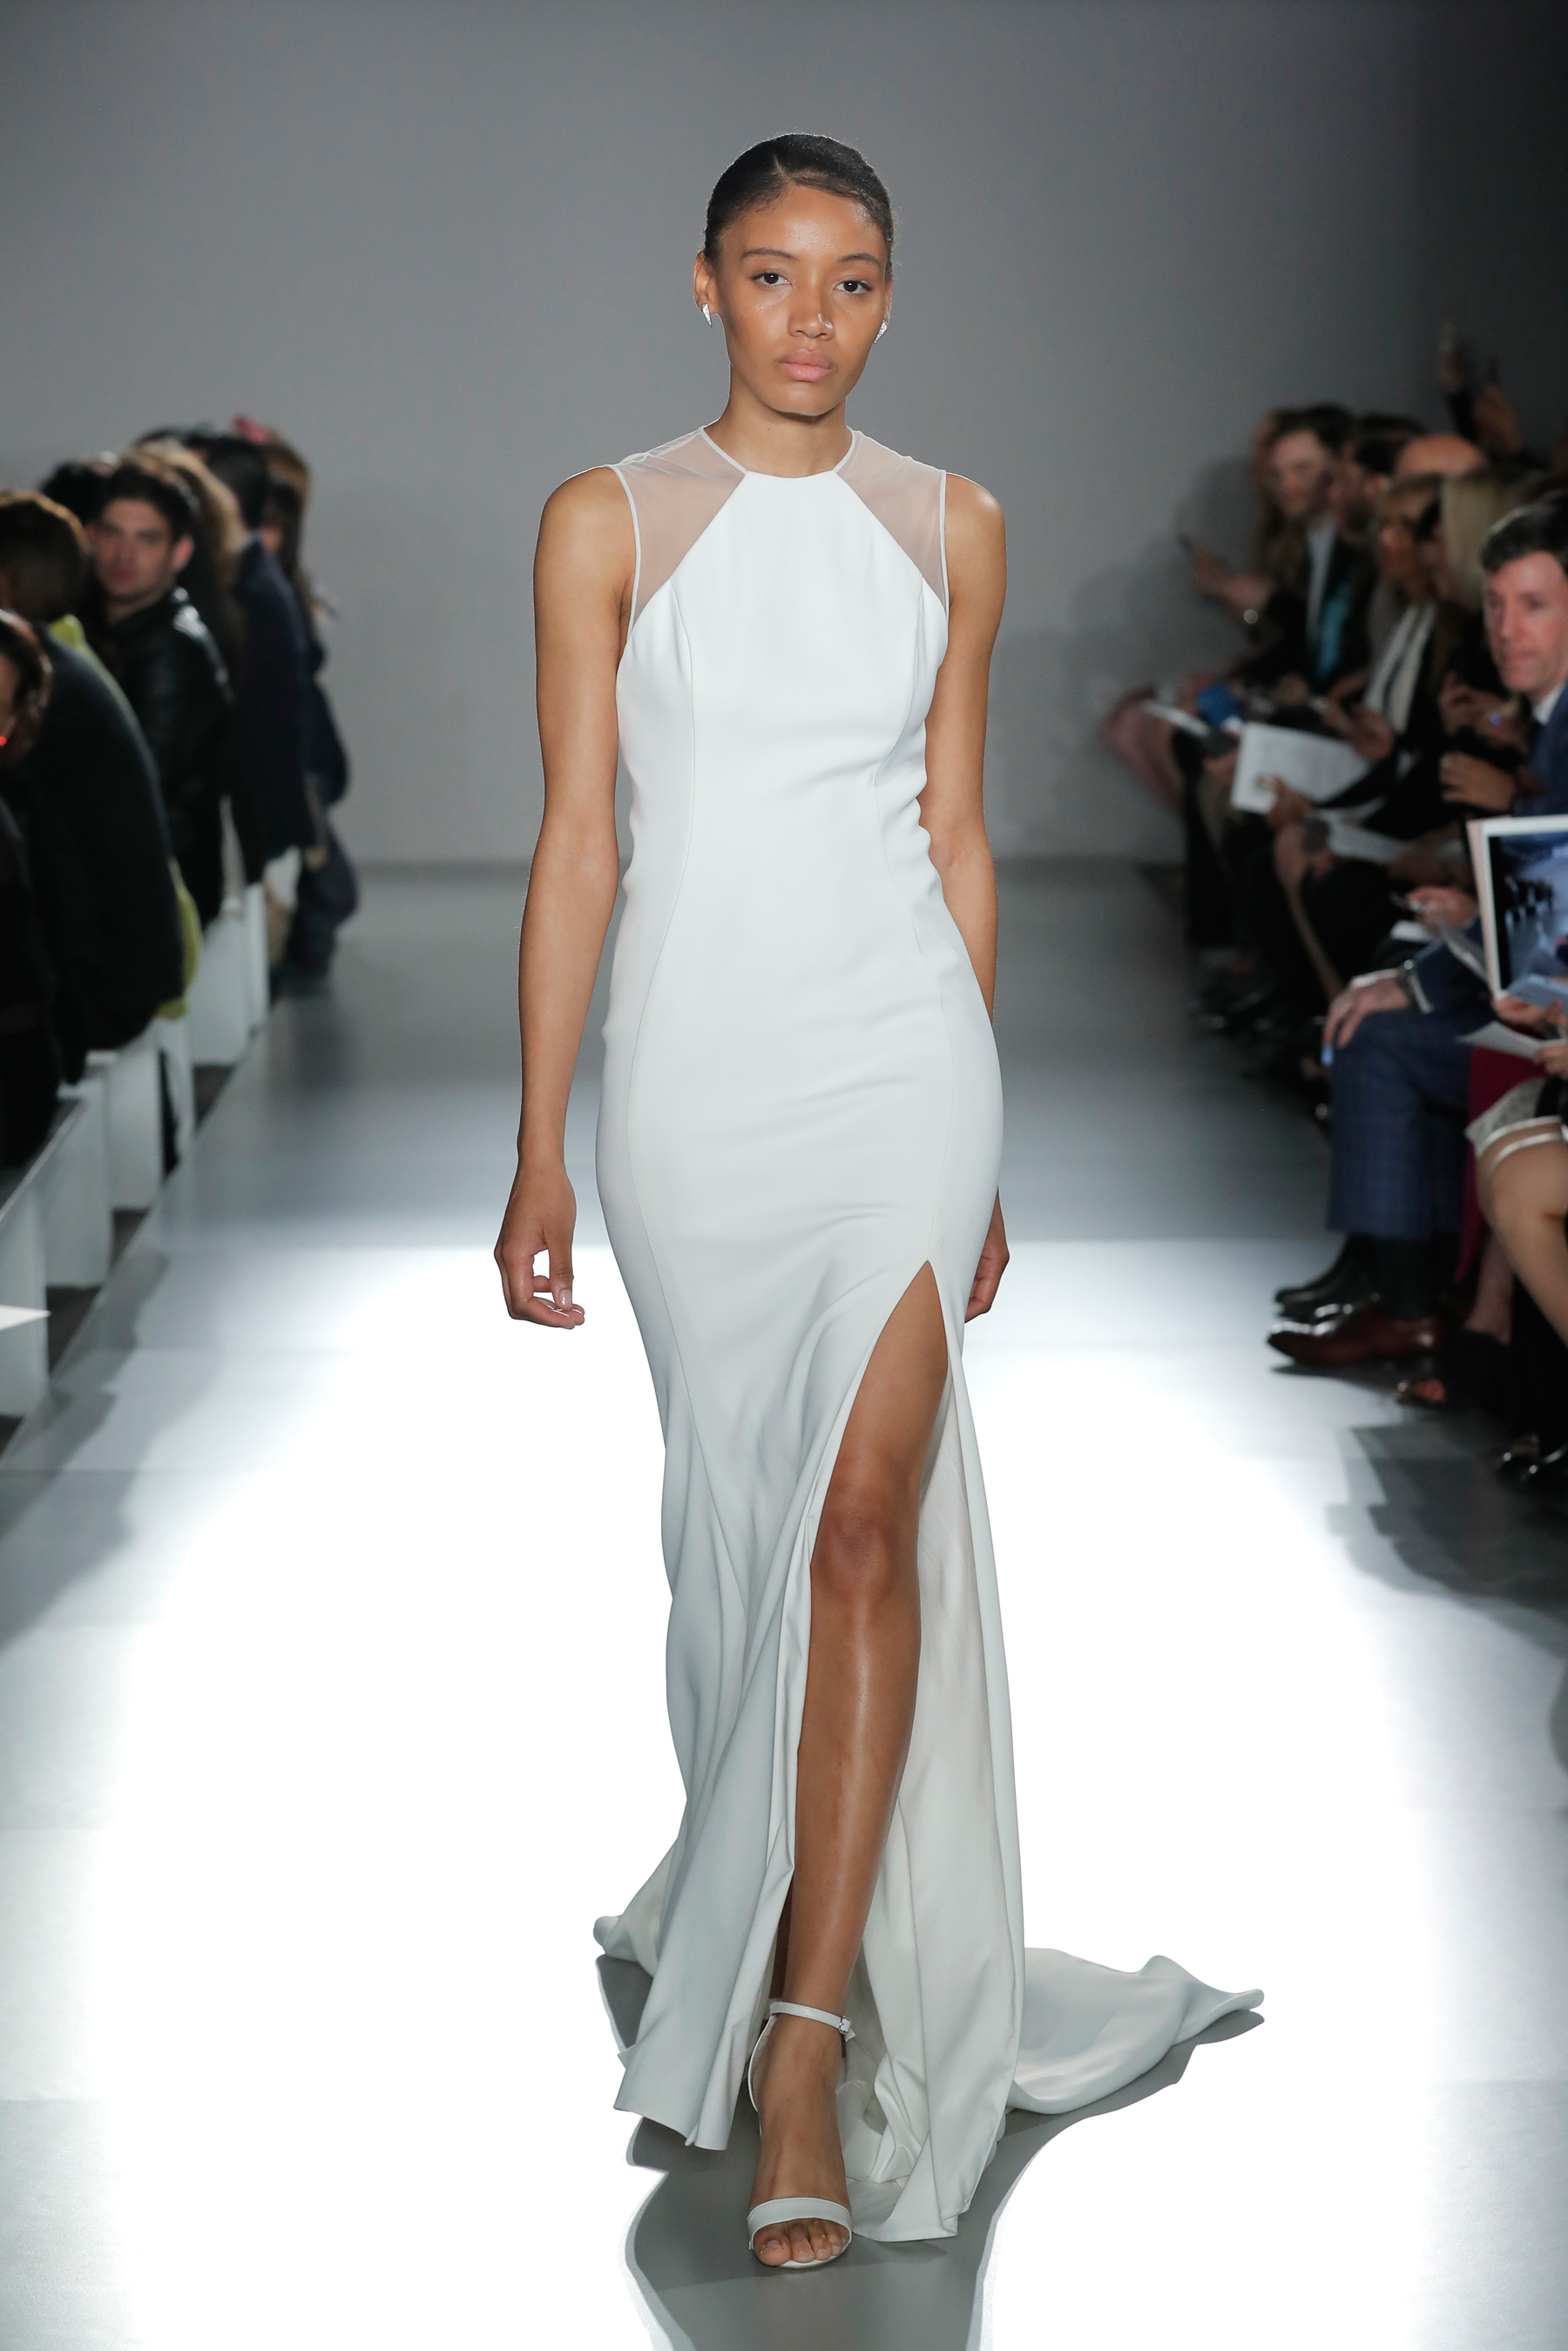 nouvelle amsale sleeveless illusion jewel neckline wedding dress with slit spring 2020